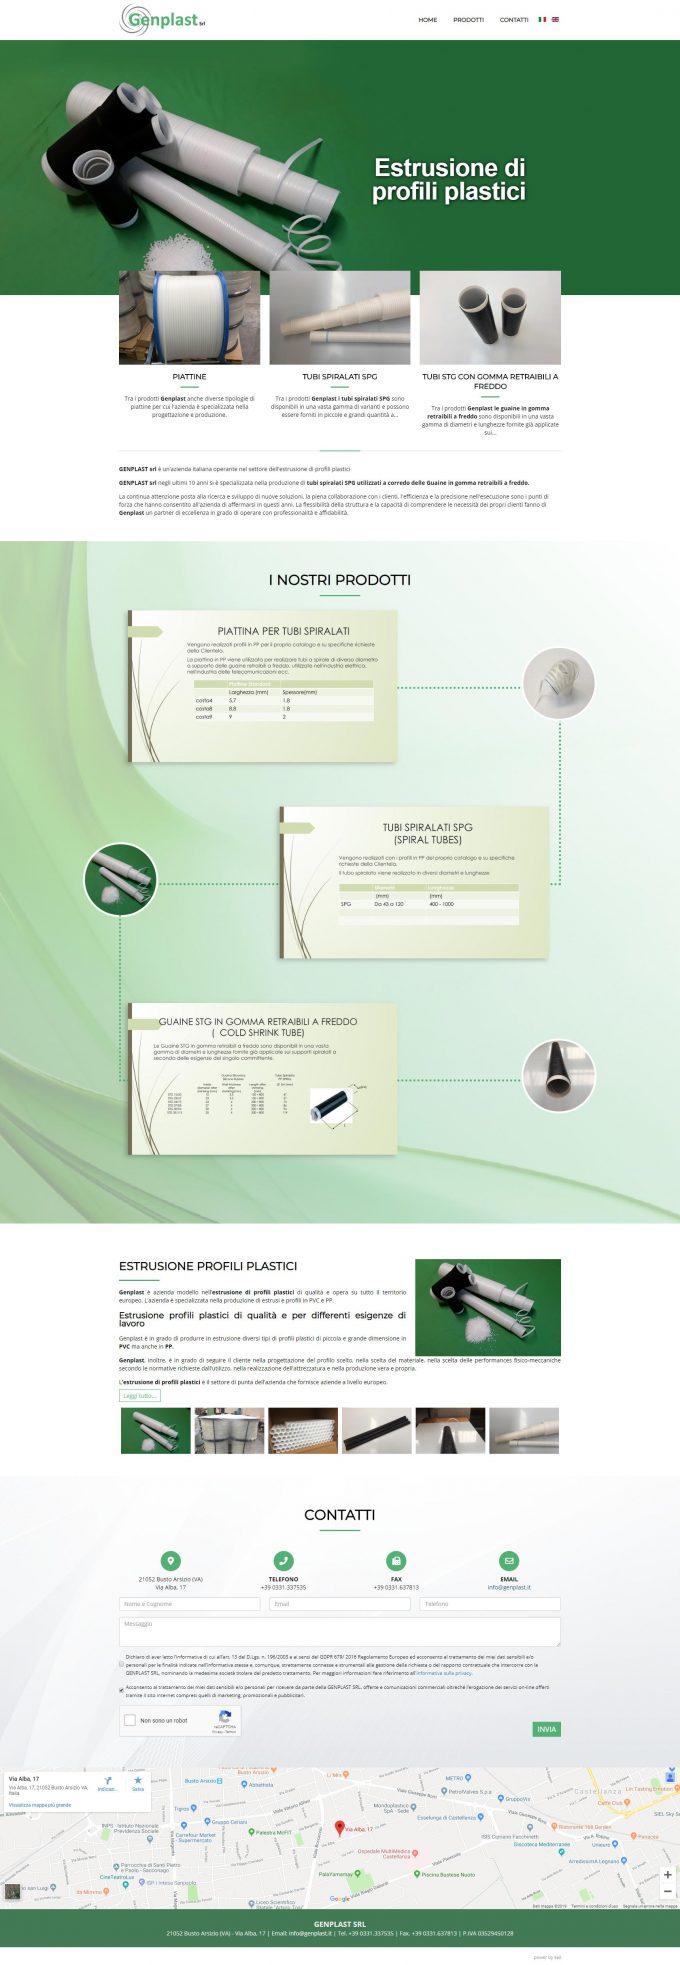 Genplast Srl  – Estrusione profili plastici